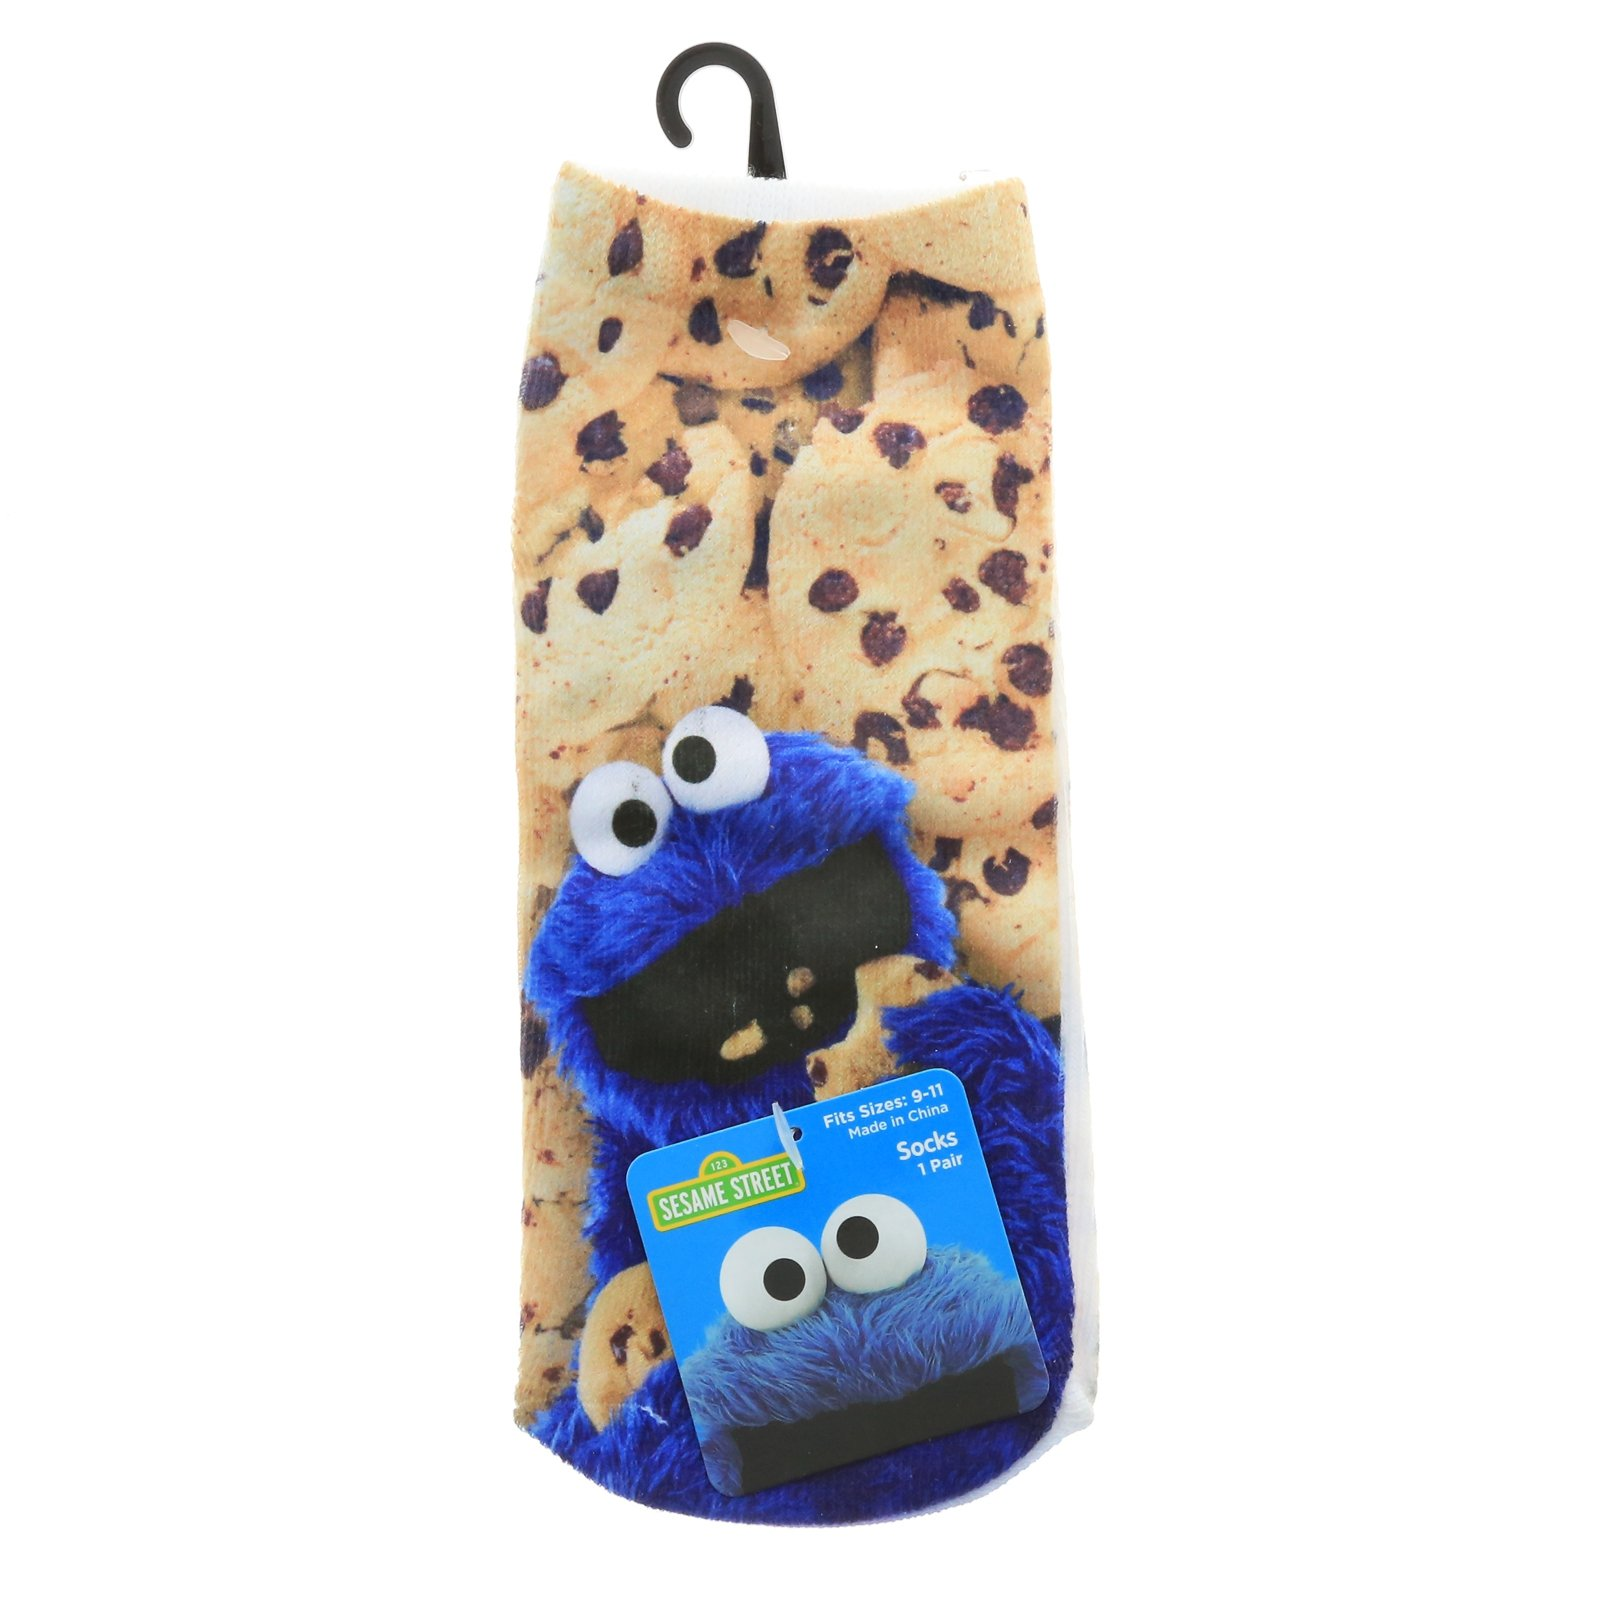 Sesame Street Cookie Monster Unisex Ankle Socks 1 Pair Size 9 - 11